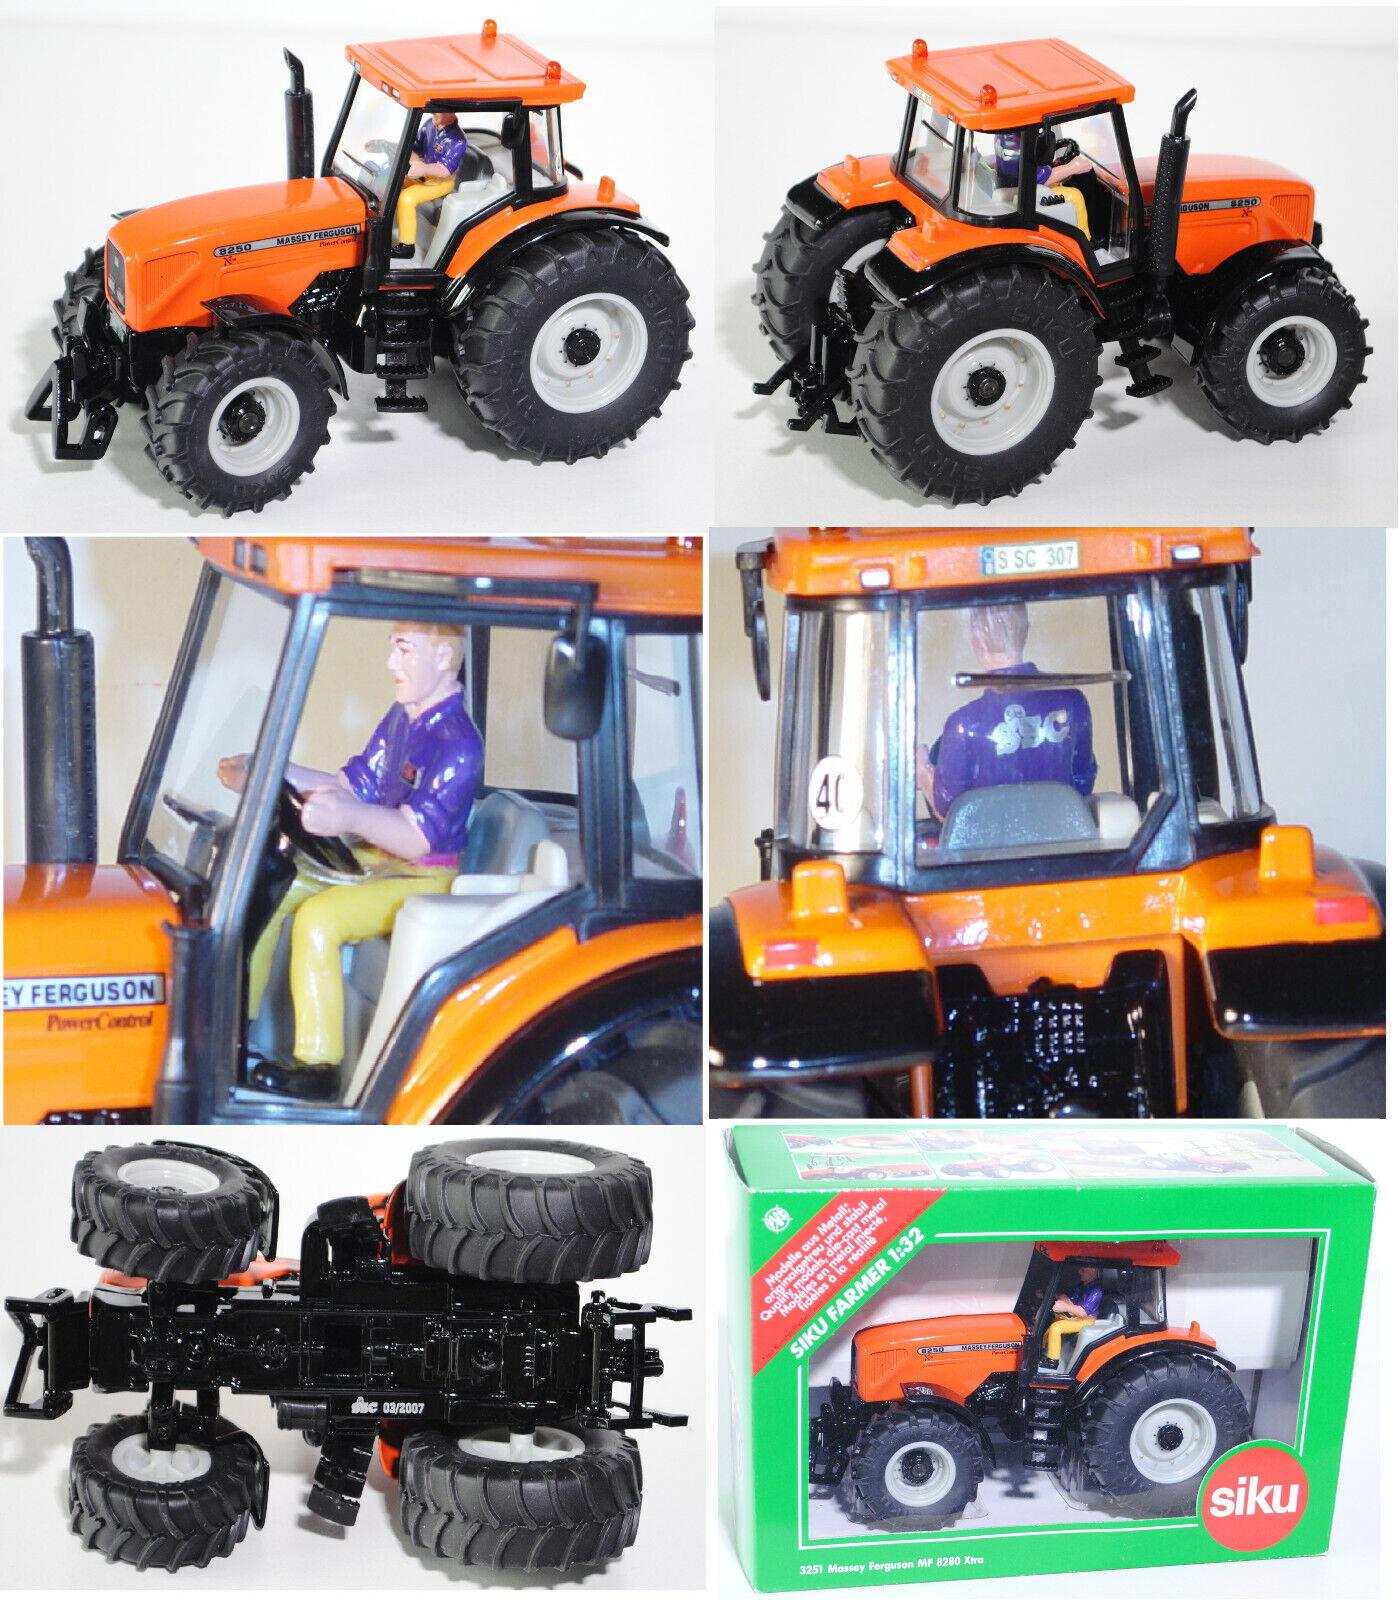 Siku Farmer 3251 Massey Ferguson MF 8250 XTRA Trattore, 1 32, SSC modello speciale